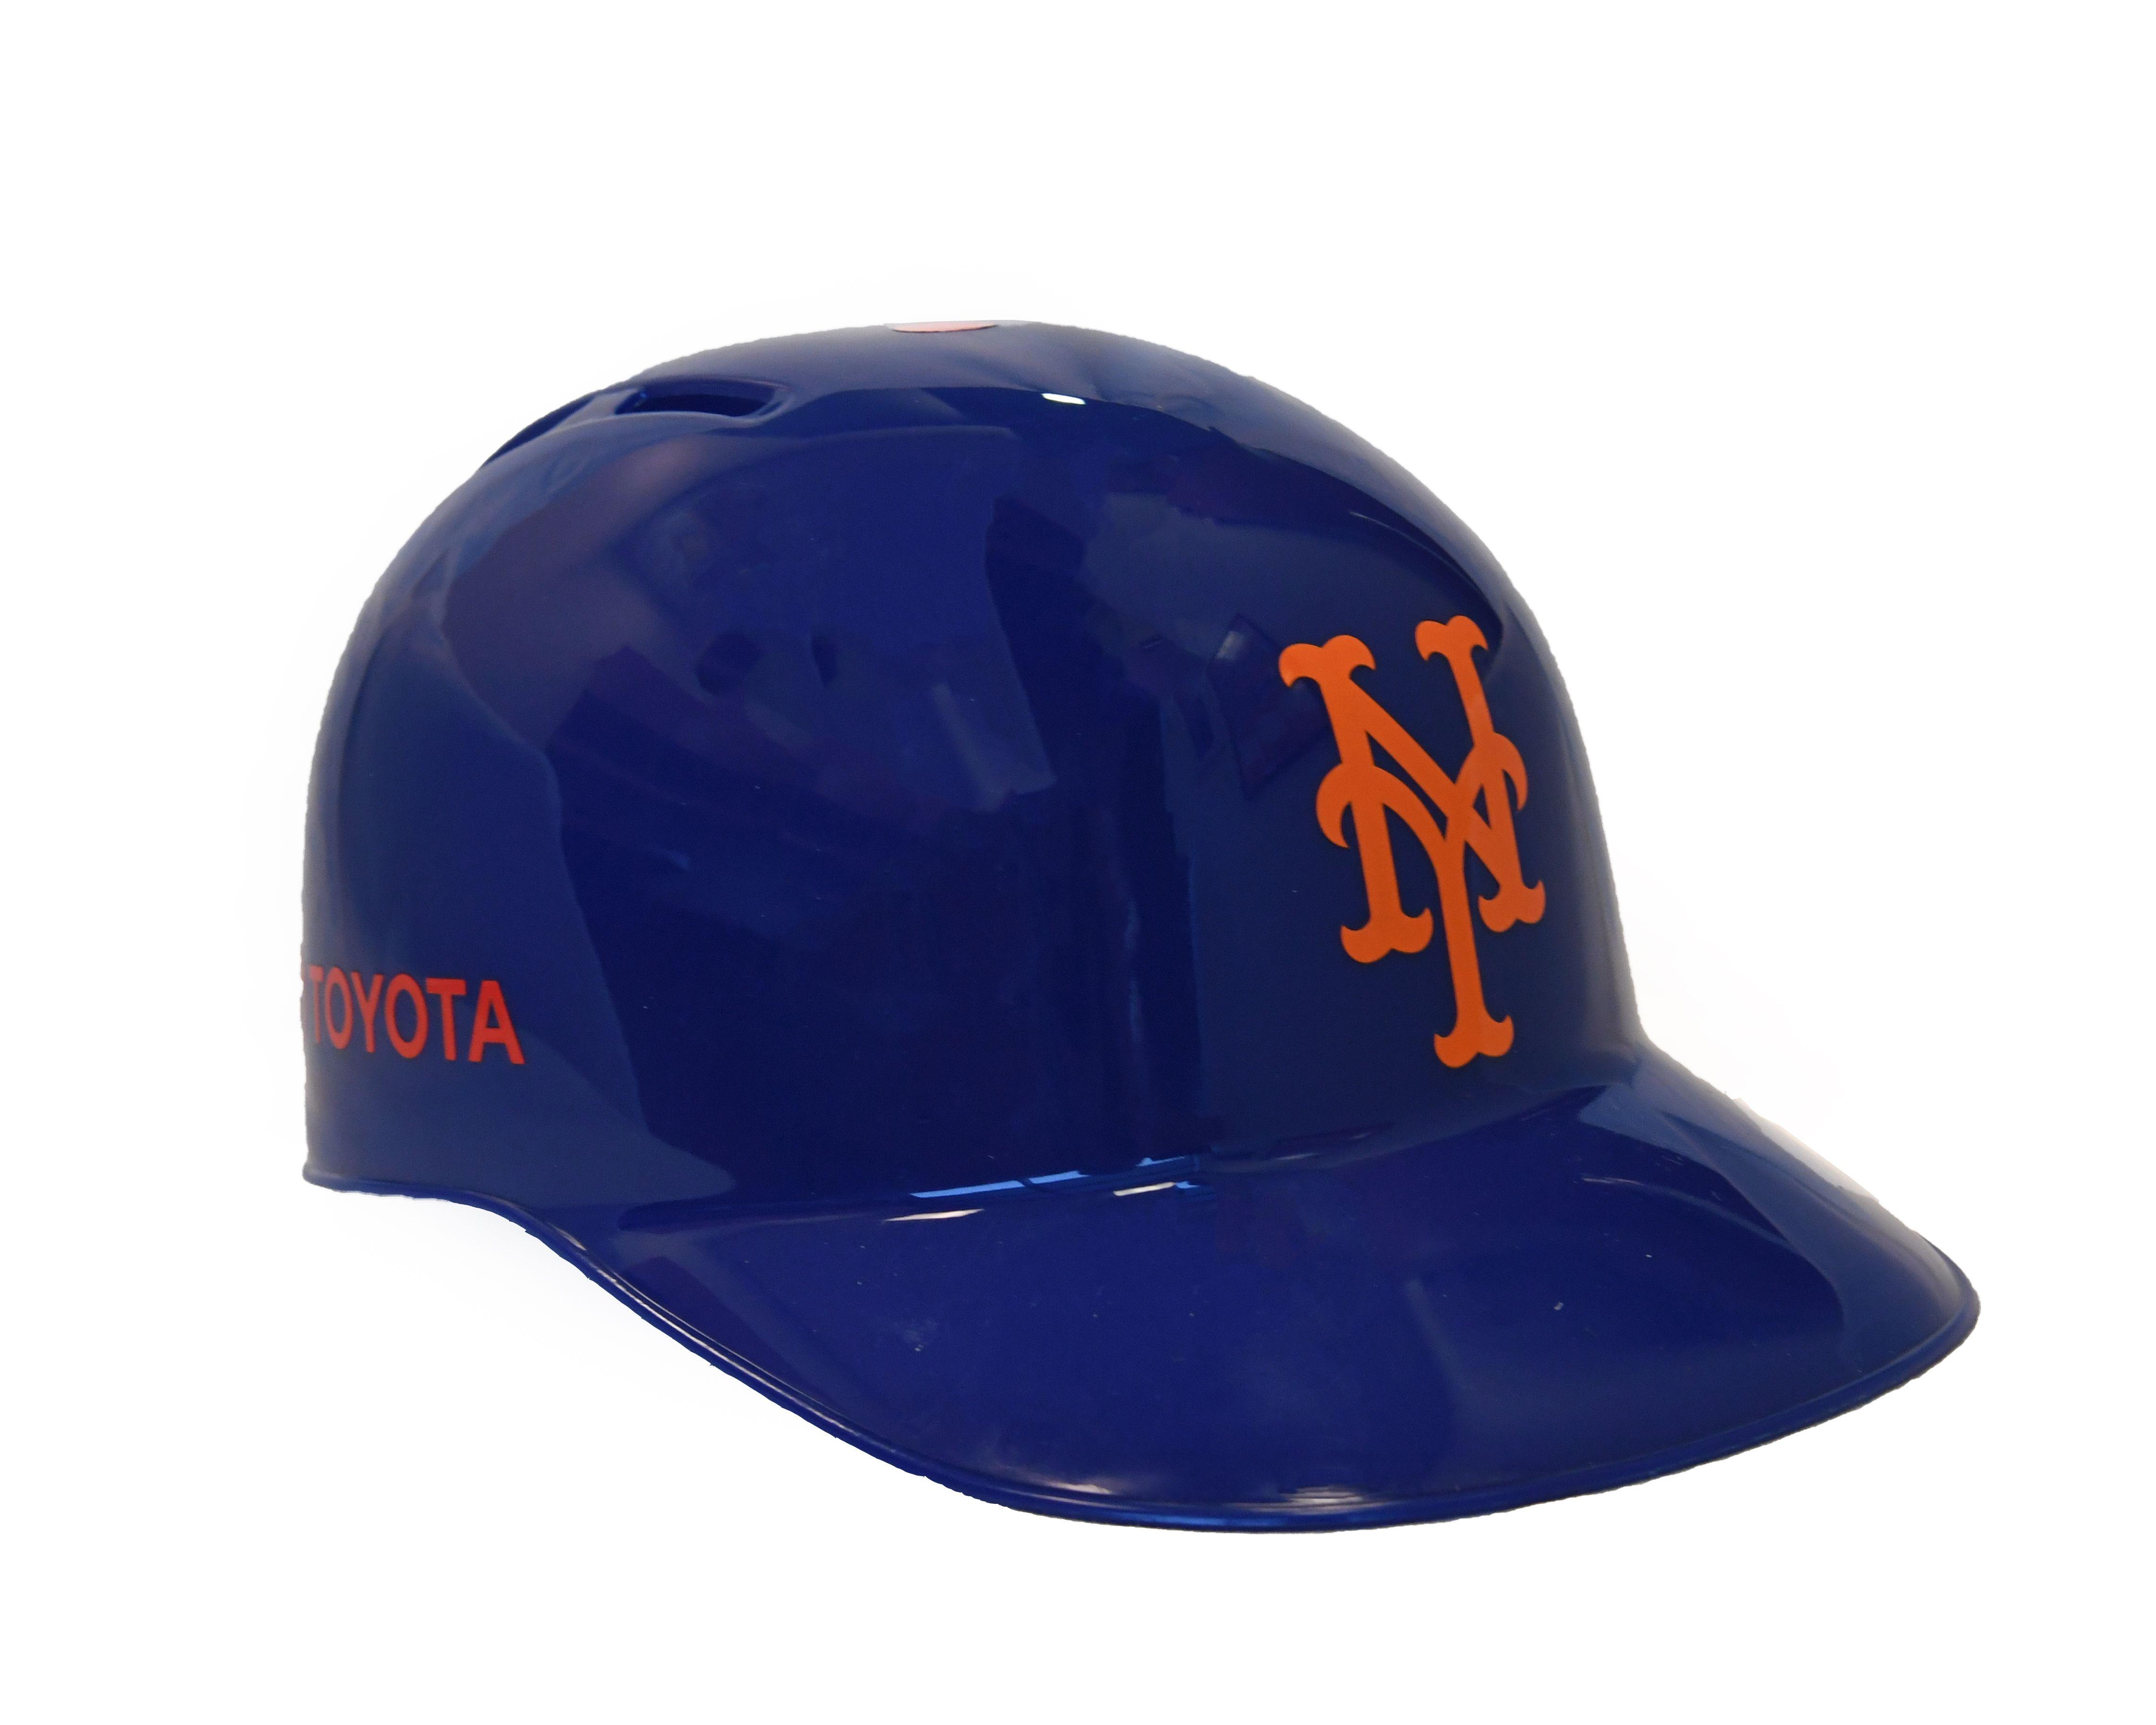 Batting Helmet July 2nd Batting Helmet Major League Baseball Teams New York Mets